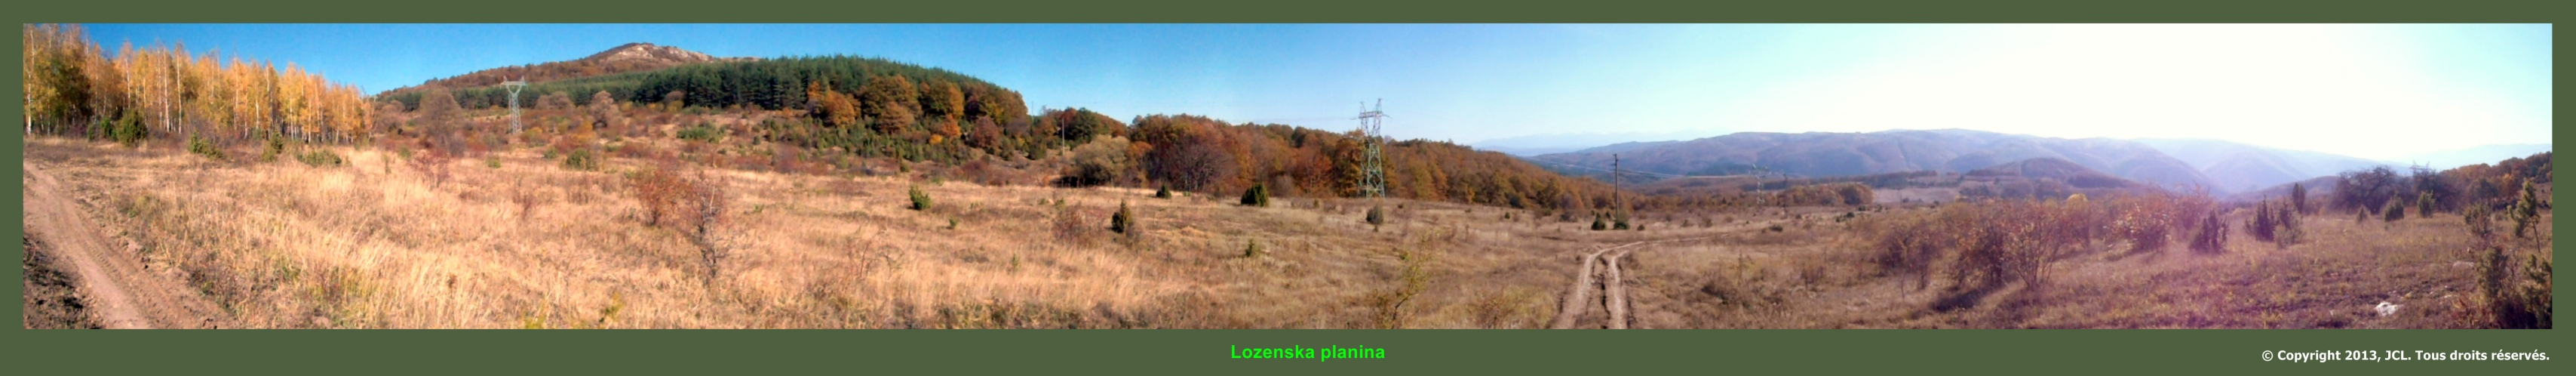 panorama lozenska planina